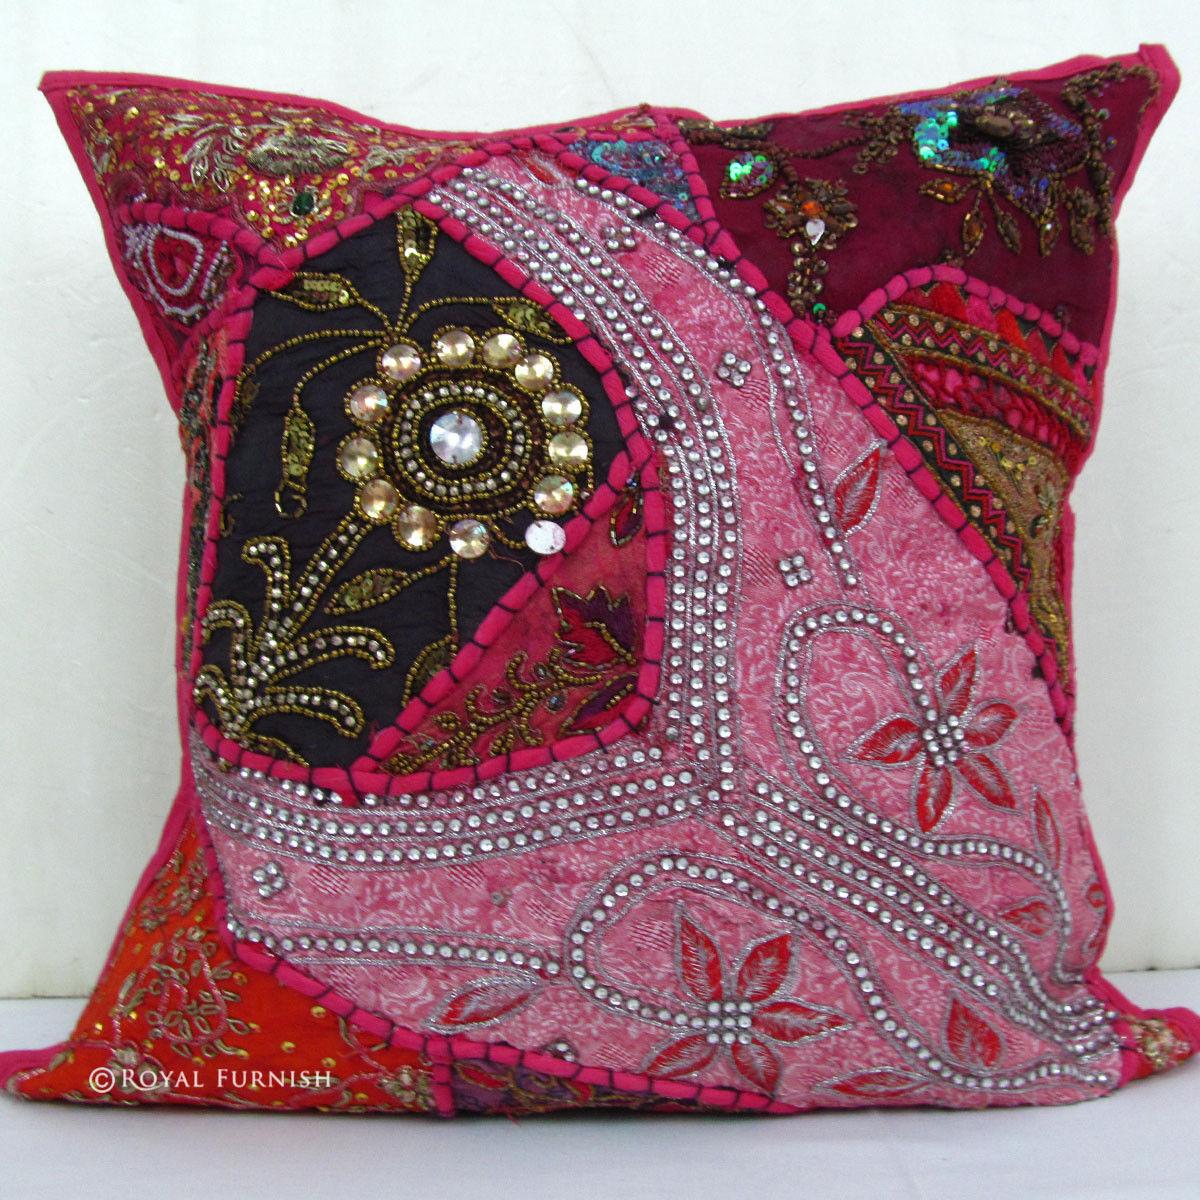 Pink Beaded Decorative Pillow : Pink Tribal Bohemian Heavy Beaded Vintage Decorative Throw Pillow - RoyalFurnish.com